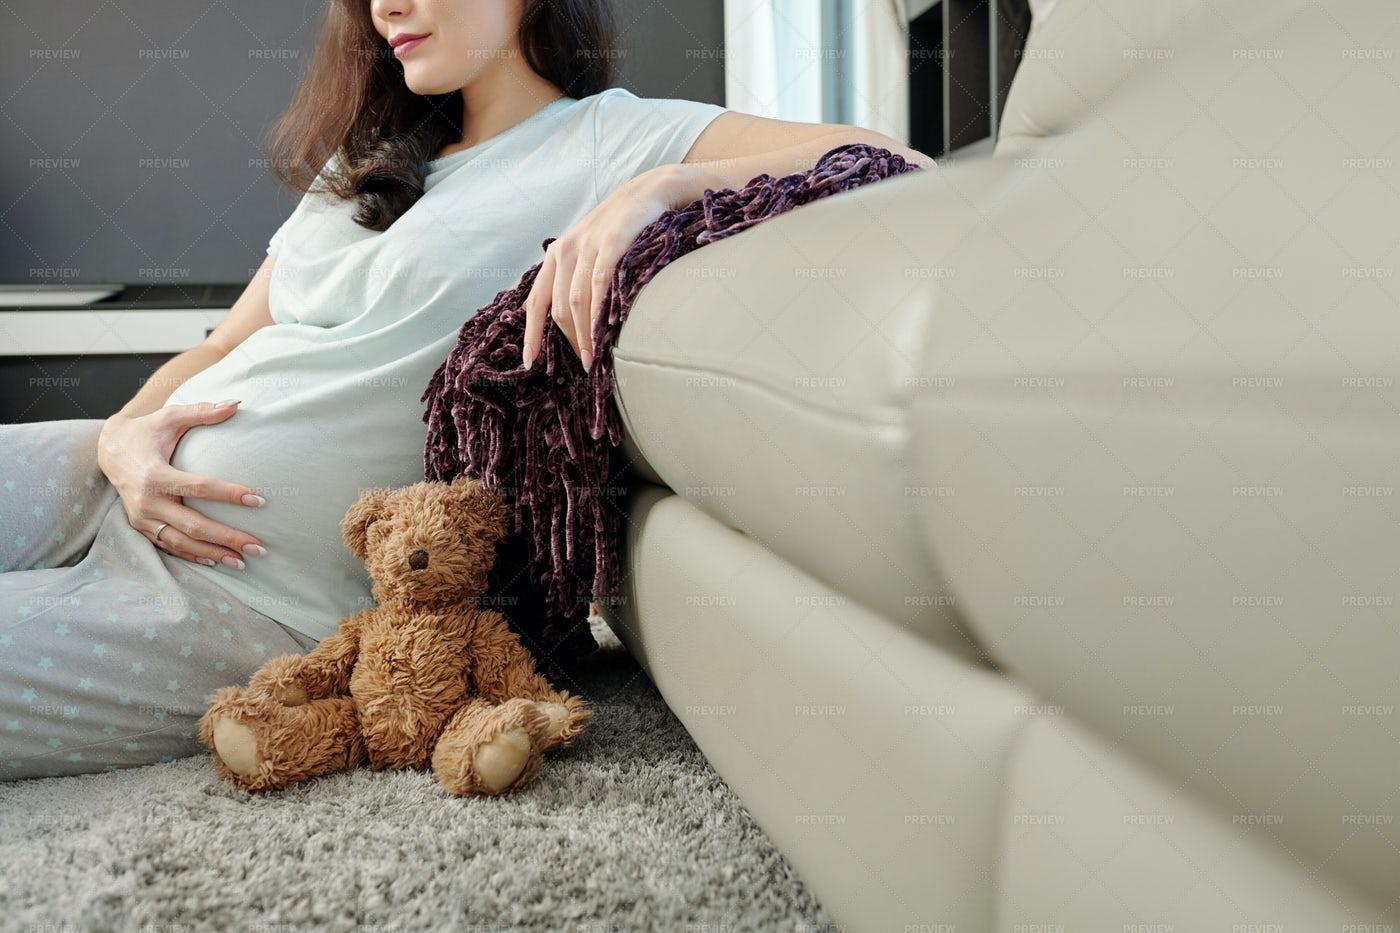 Young Woman Enjoying Her Pregnancy: Stock Photos